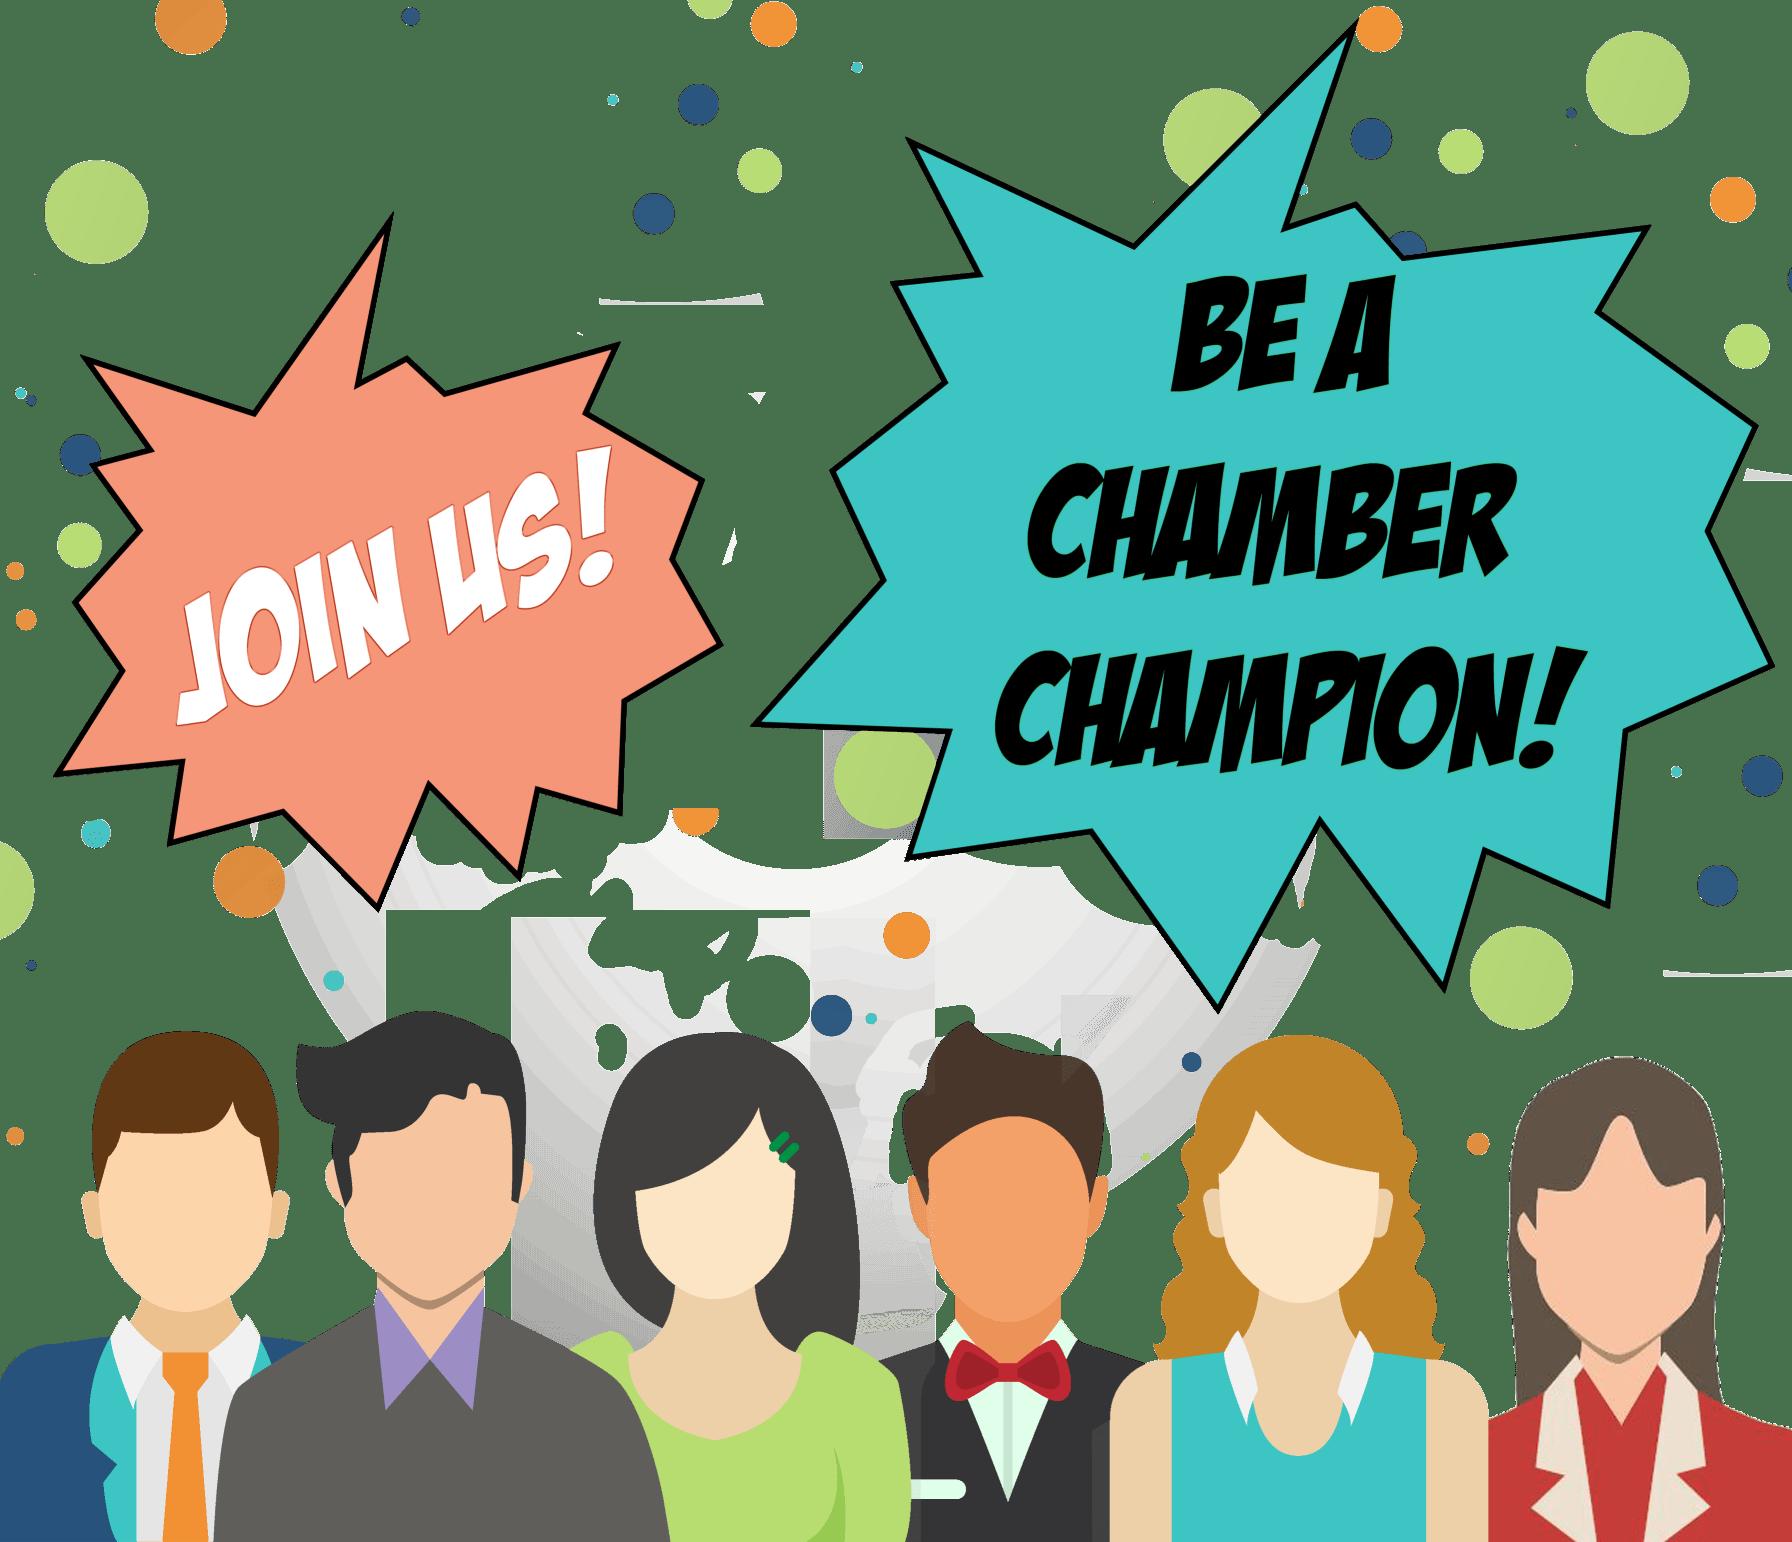 Win clipart bay window. Chamber champion petoskey regional